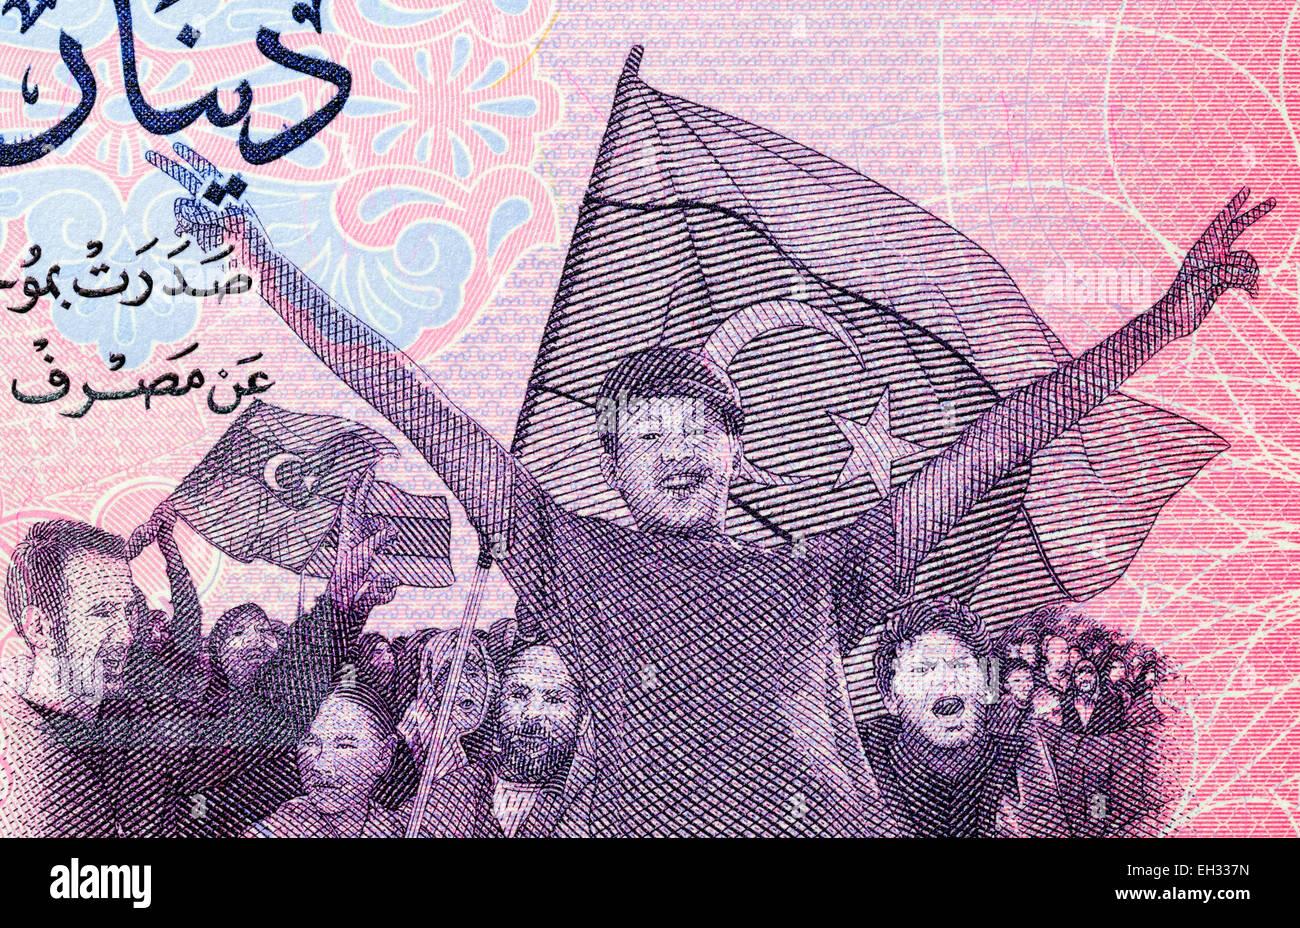 Anti-Gaddafi Demonstranten von 1 Dinar Banknote, Libyen, 2013 Stockbild